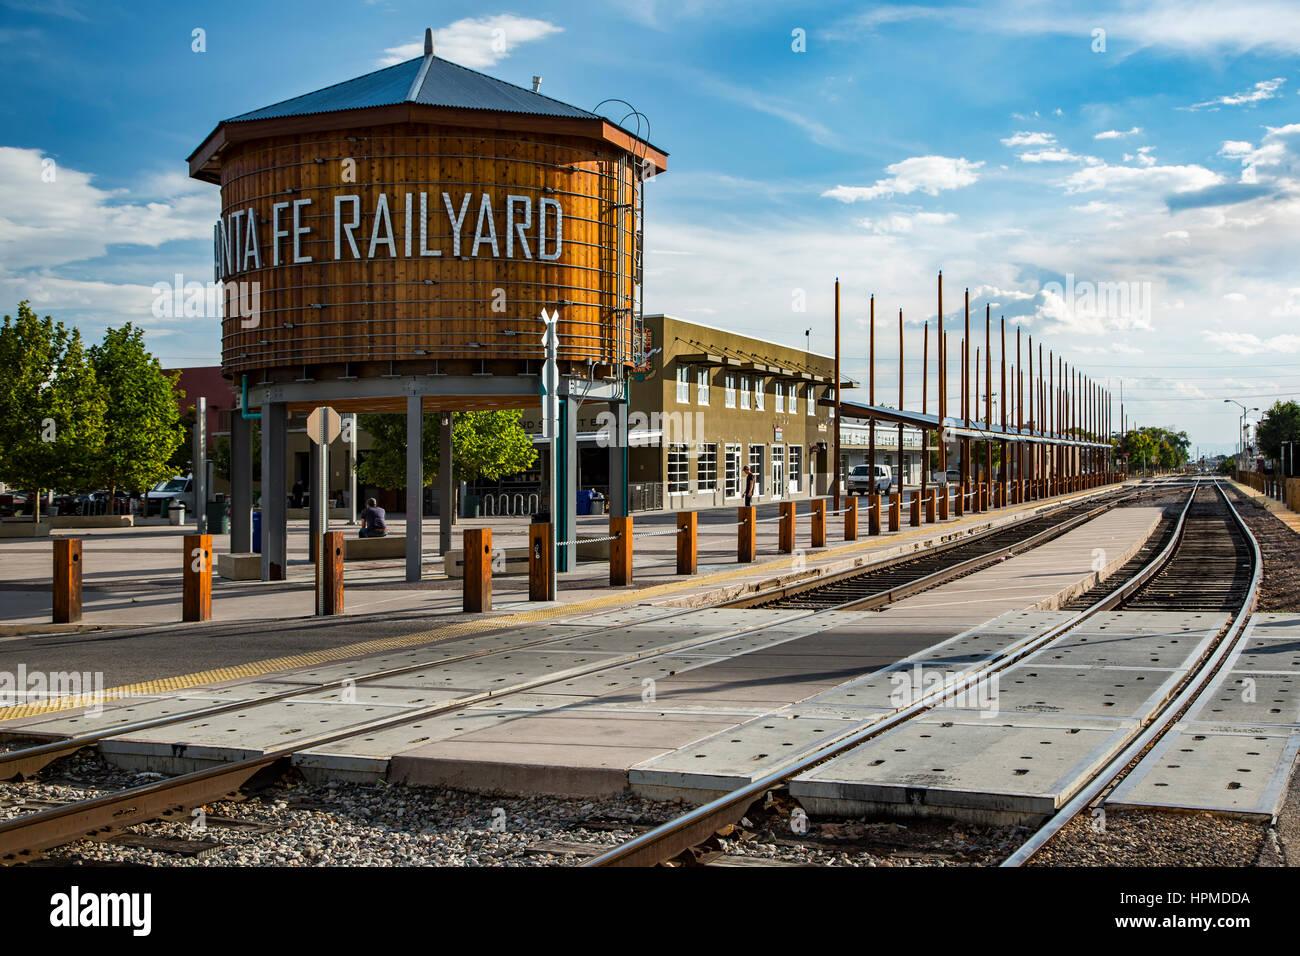 Water tank and tracks, Railyard District, Santa Fe, New Mexico USA - Stock Image